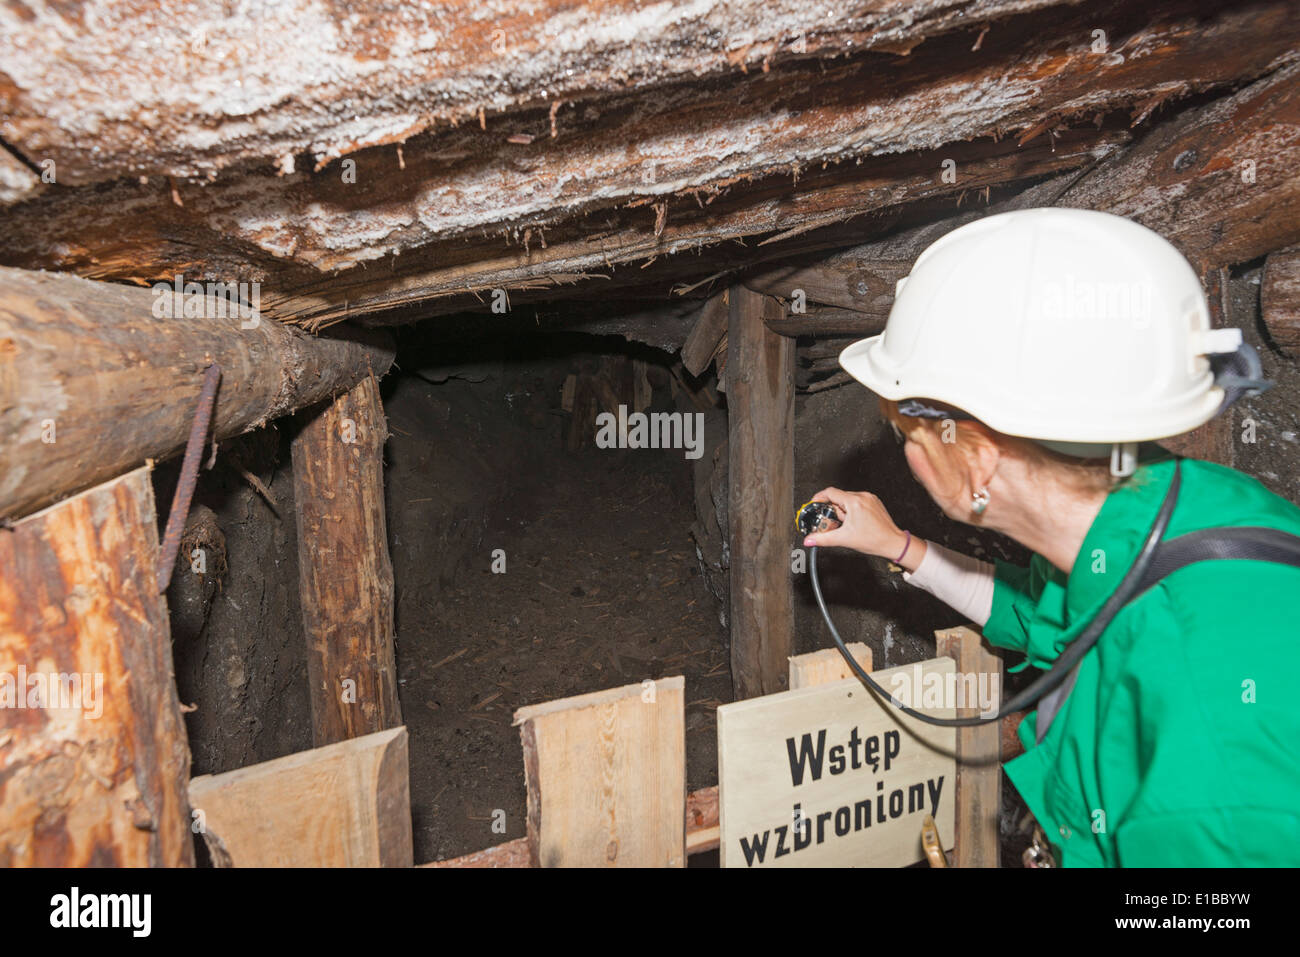 Europe, Poland, Malopolska, Krakow, Wieliczka Salt Mine, Miners route, Unesco site - Stock Image